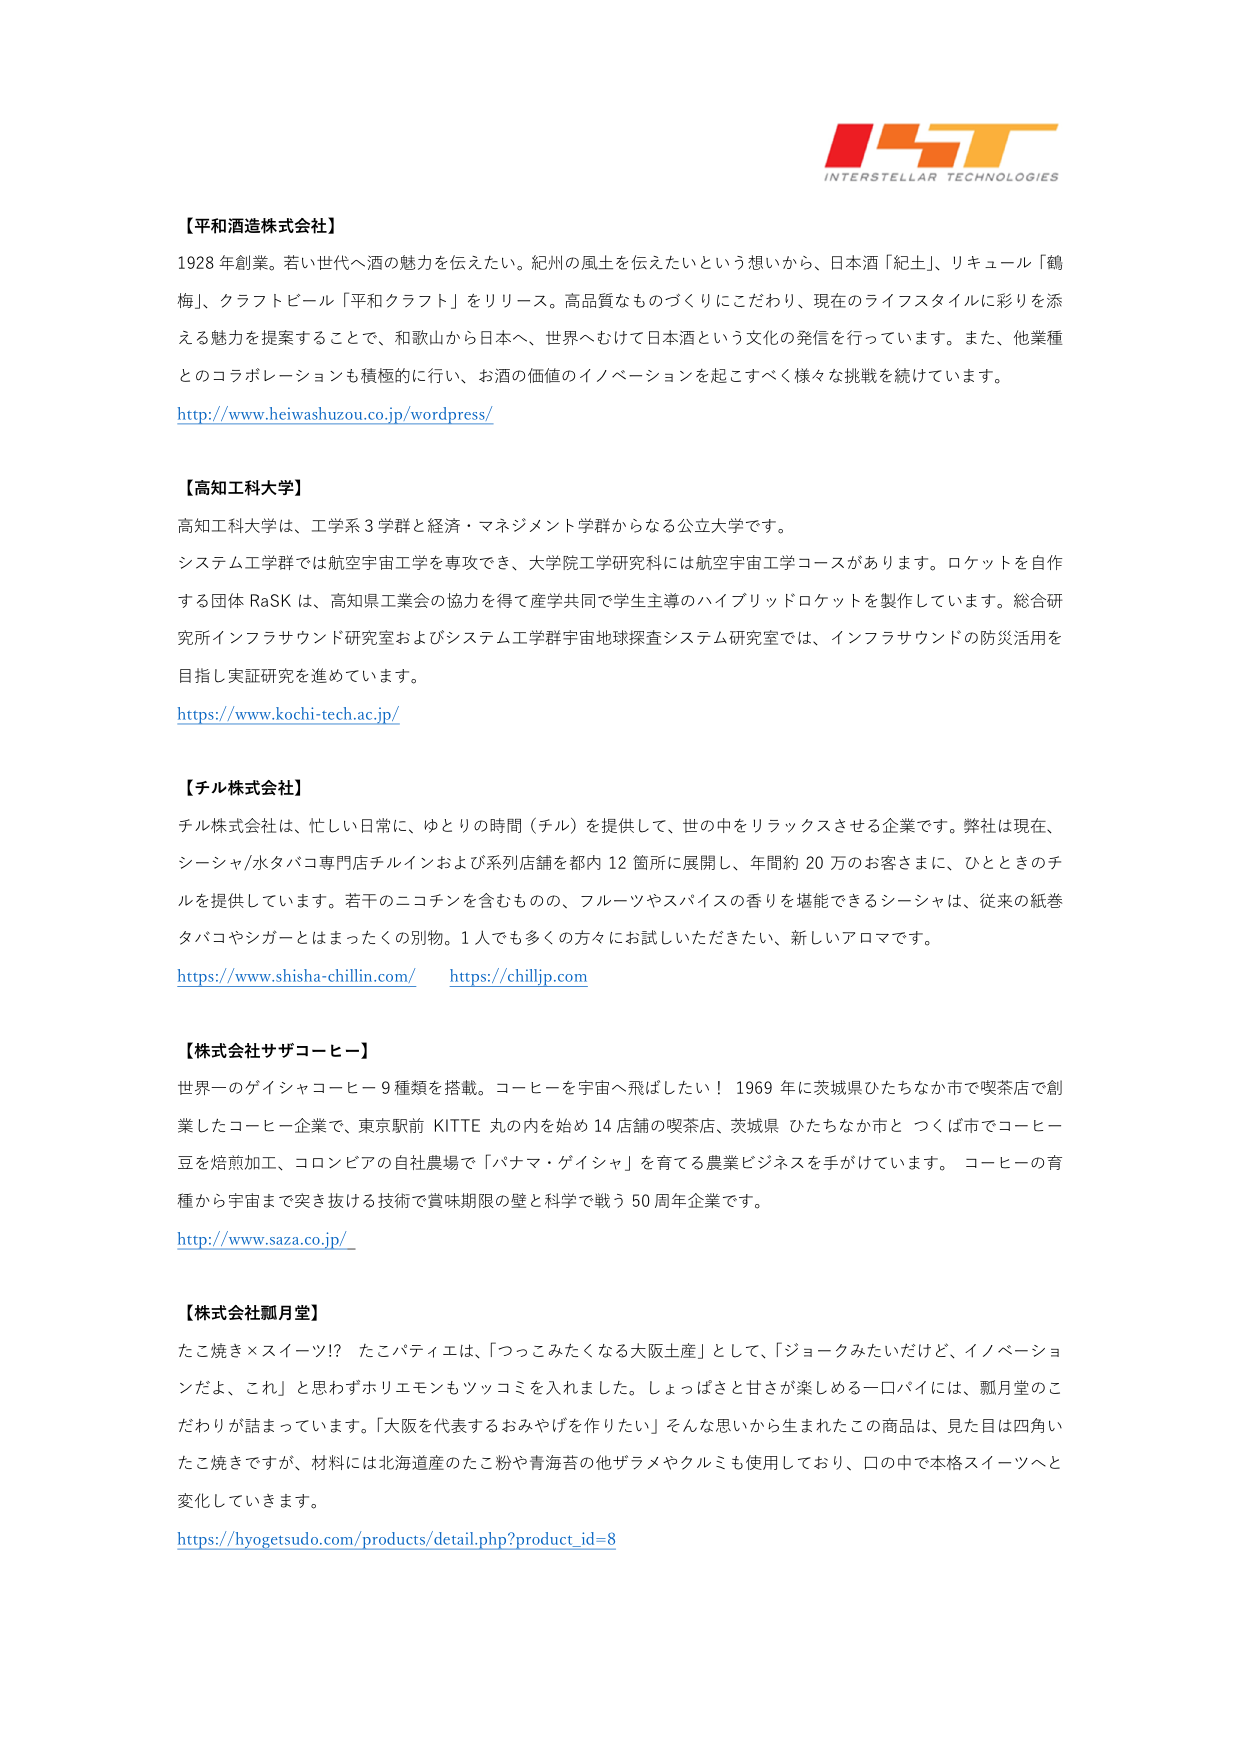 f:id:Imamura:20191126135436p:plain